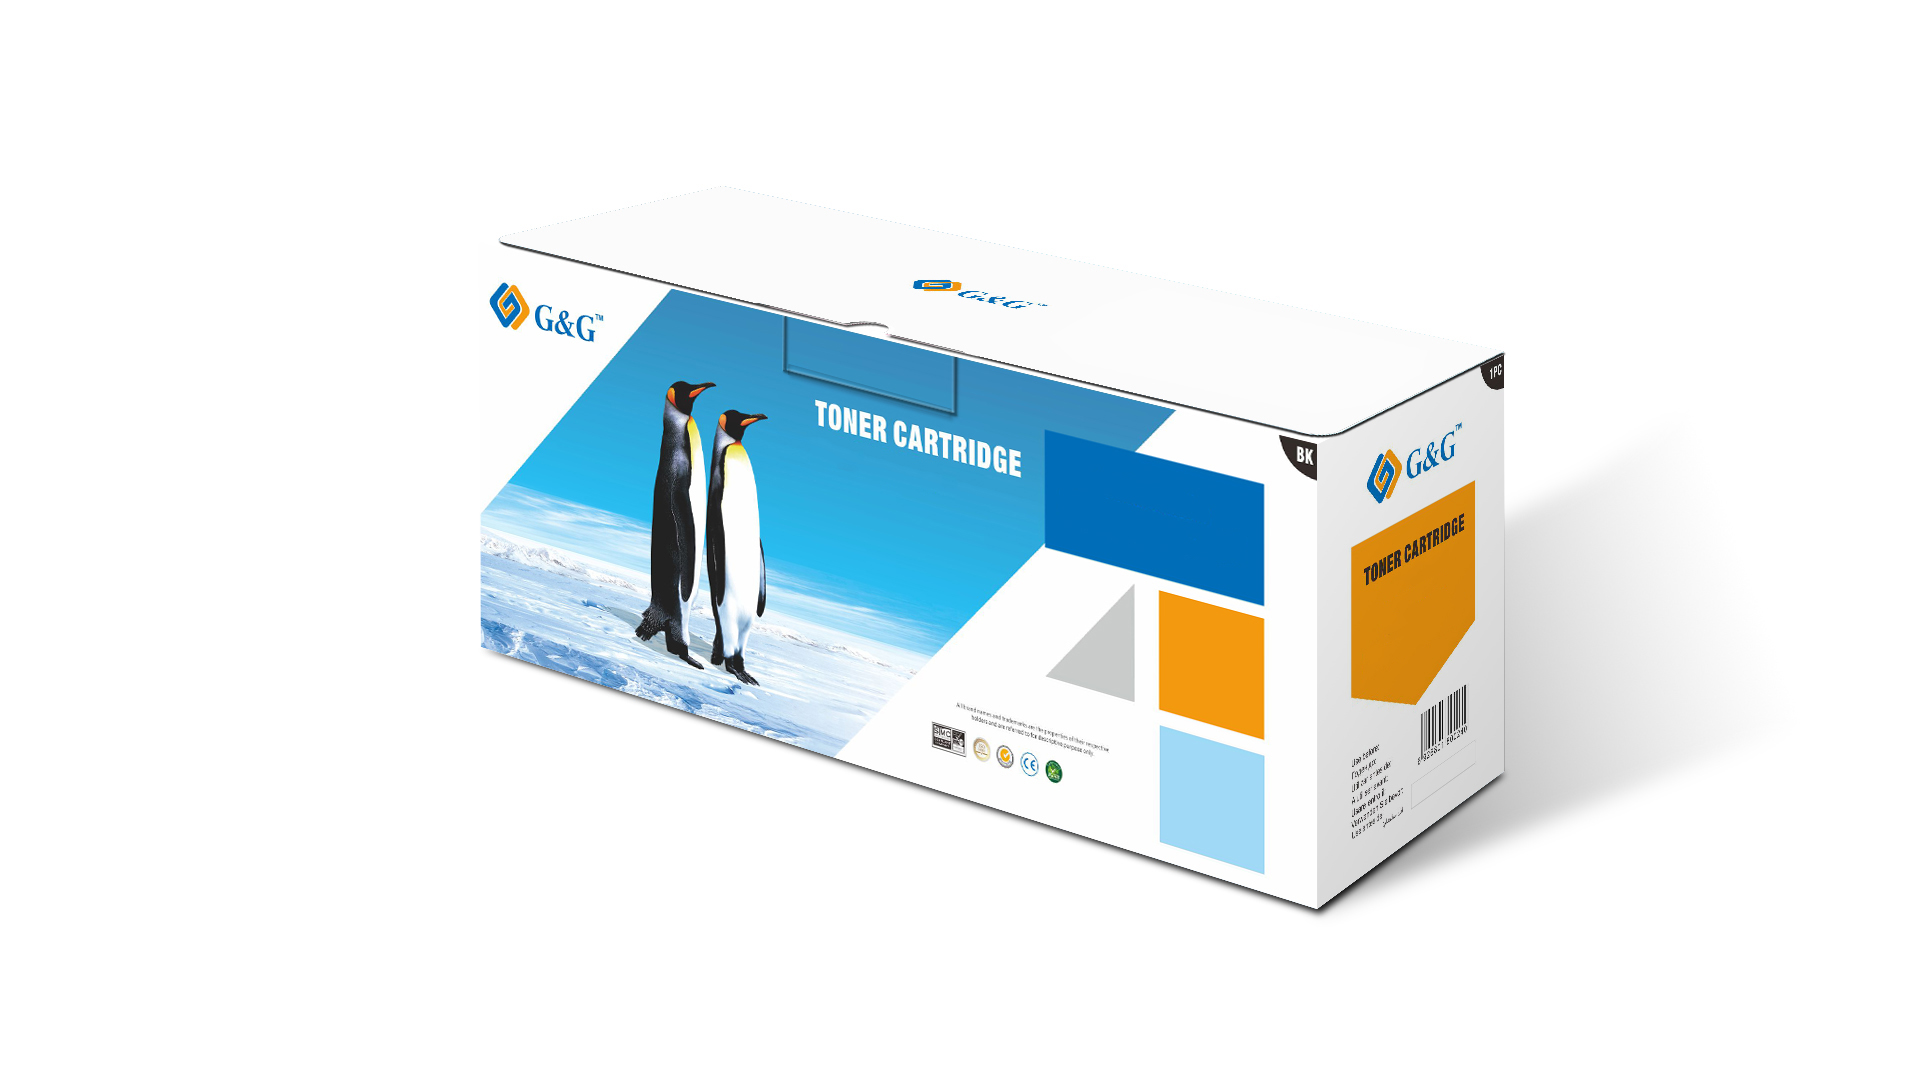 Compatible G&G Dell B1260/B1265 toner negro - Reemplaza 593-11109/RWXNT/DRYXV/593-11110/PVVWC/G9W85